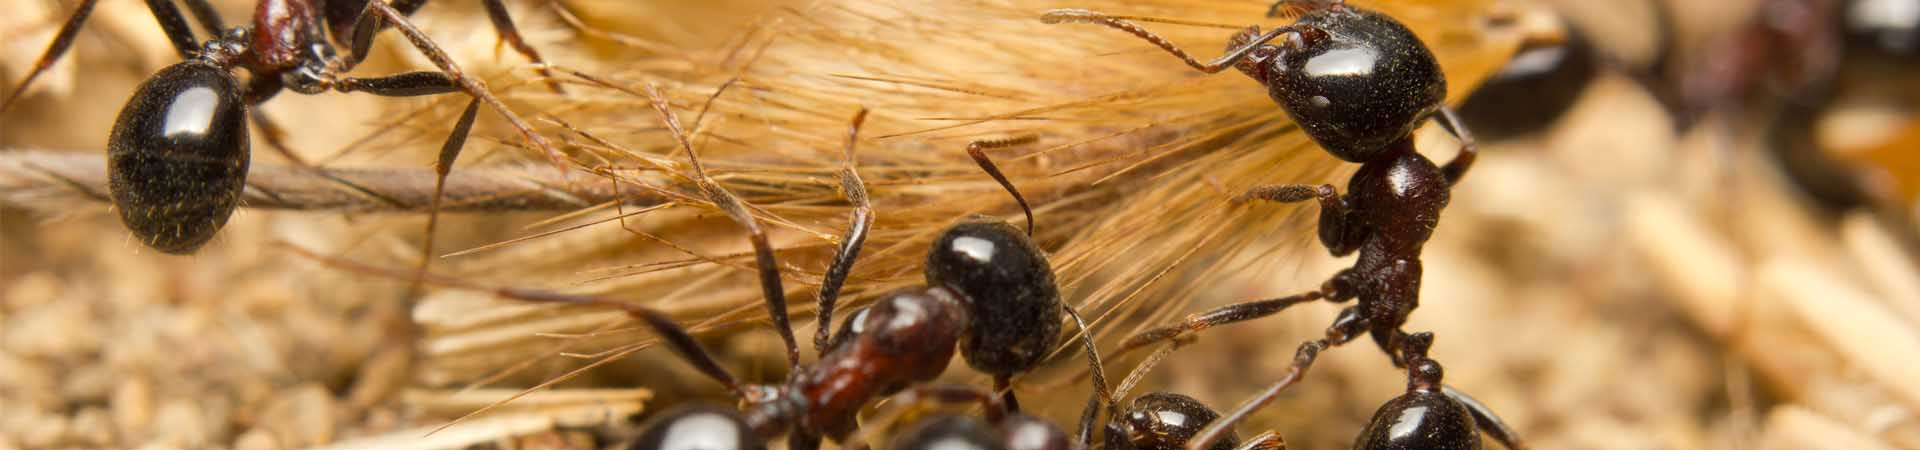 mainslide_ants_1